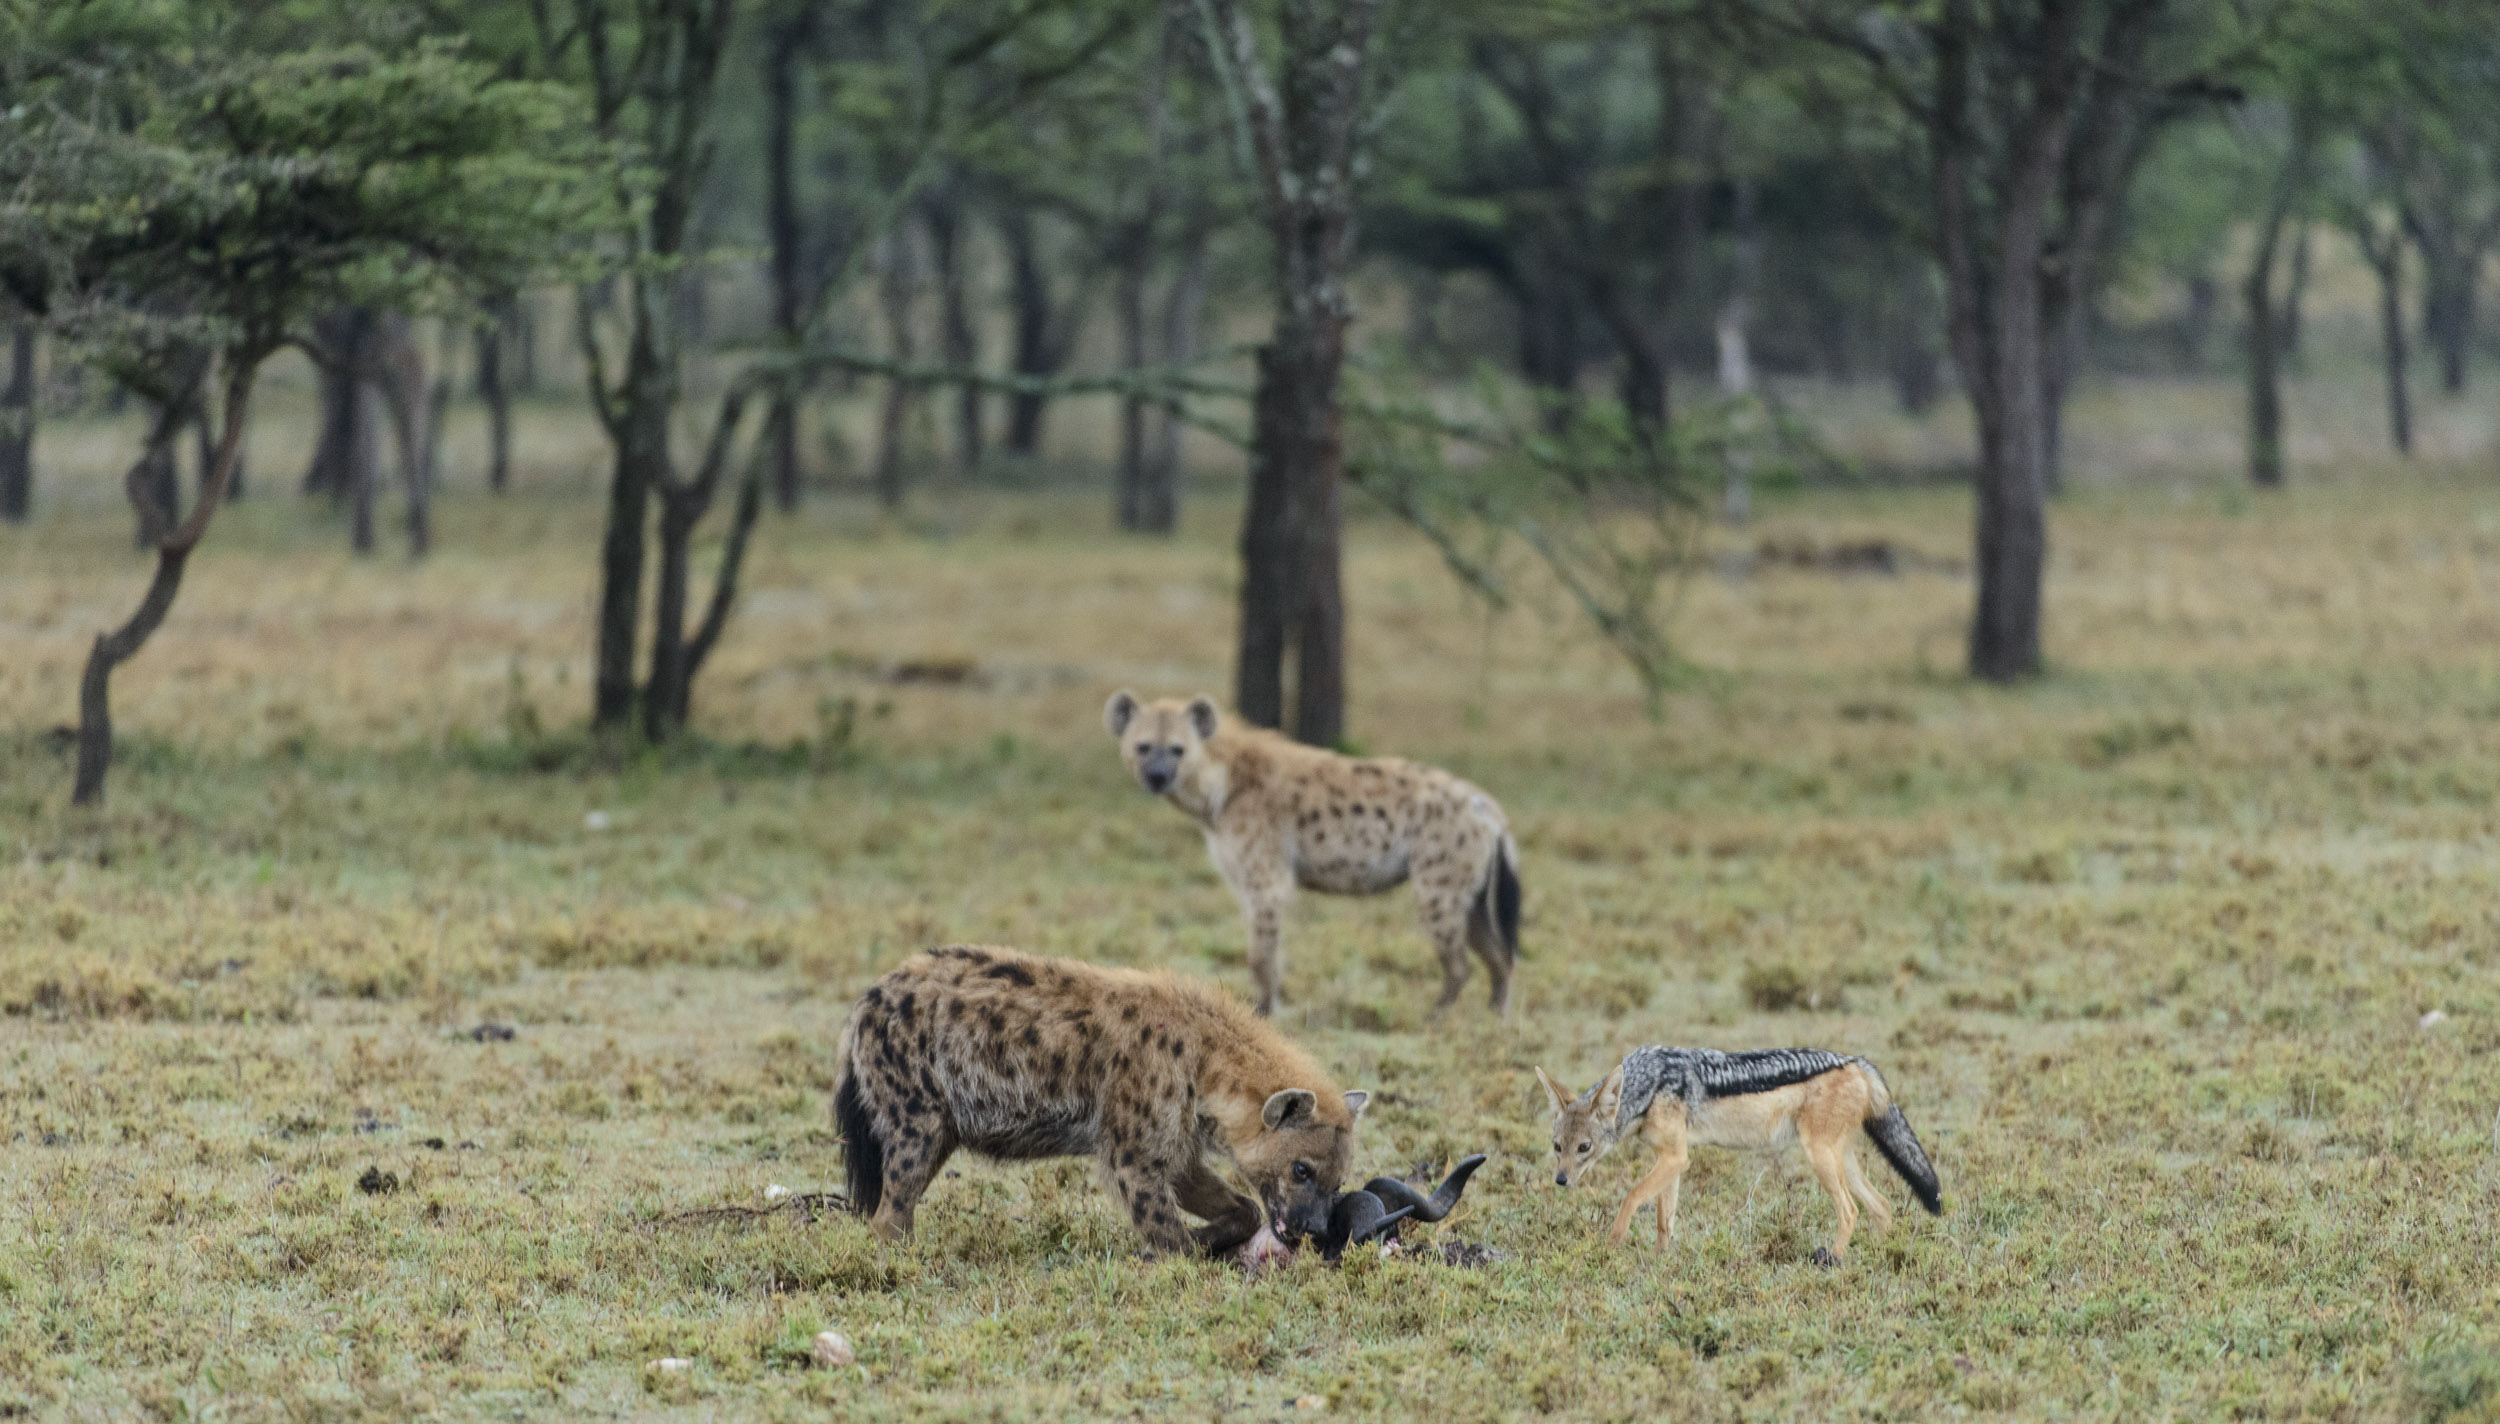 Spotted Hyena (Crocuta crocuta) and Black-backed Jackal (Canis mesomelas) scavenging from wildebeest skull, Ol Kinyei Conservancy, Kenya. 07/14.